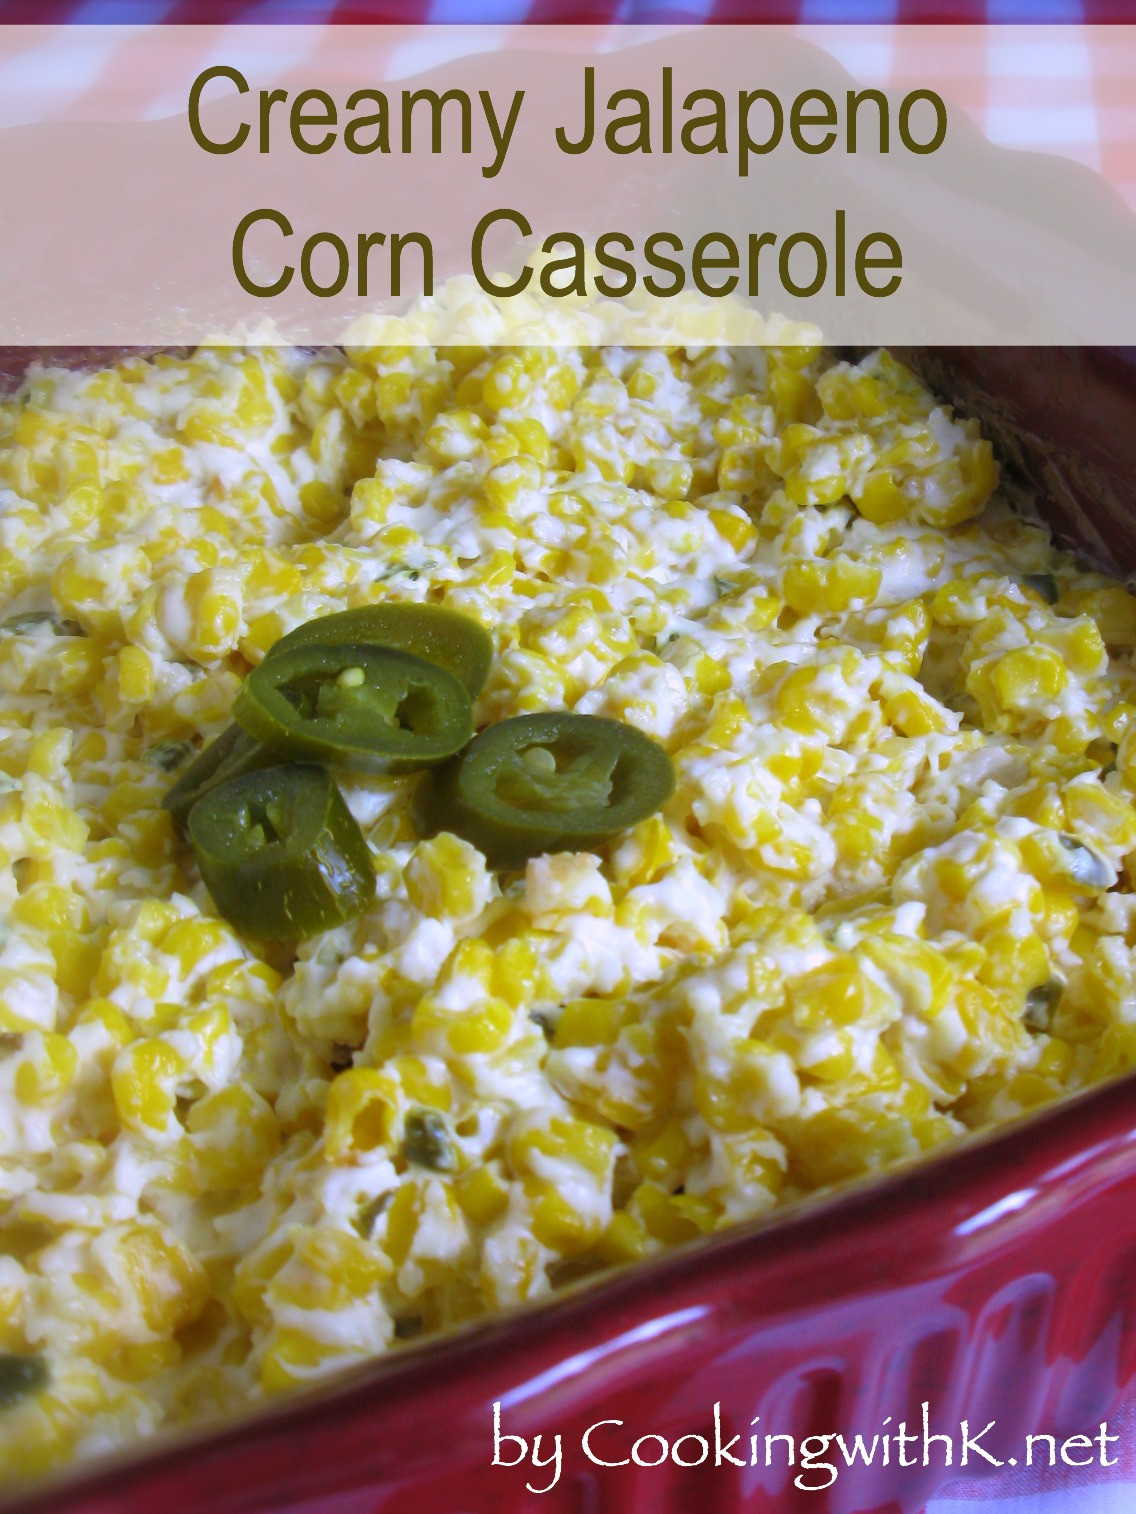 Corn Casserole With Cream Cheese  Cooking with K Creamy Jalapeno Corn Casserole